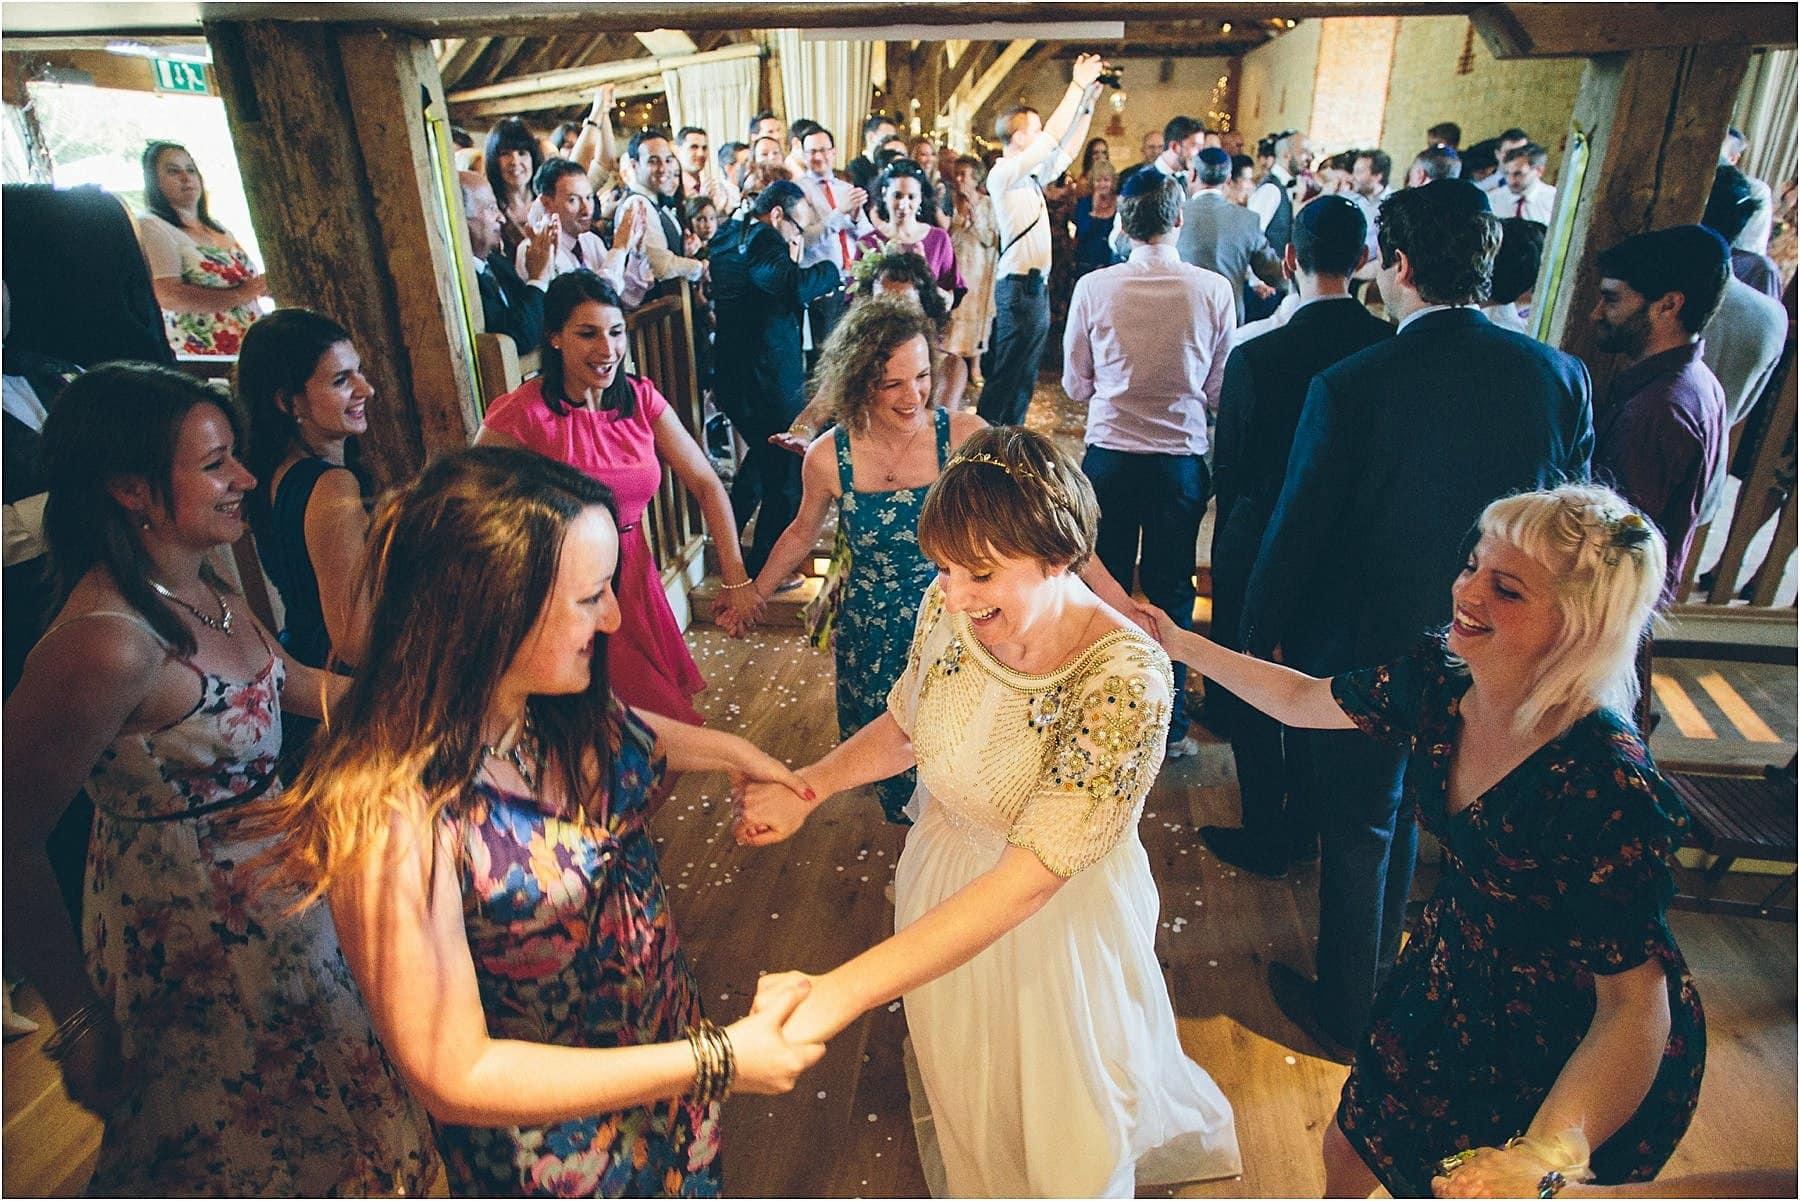 The_Barn_At_Bury_Court_Wedding_075